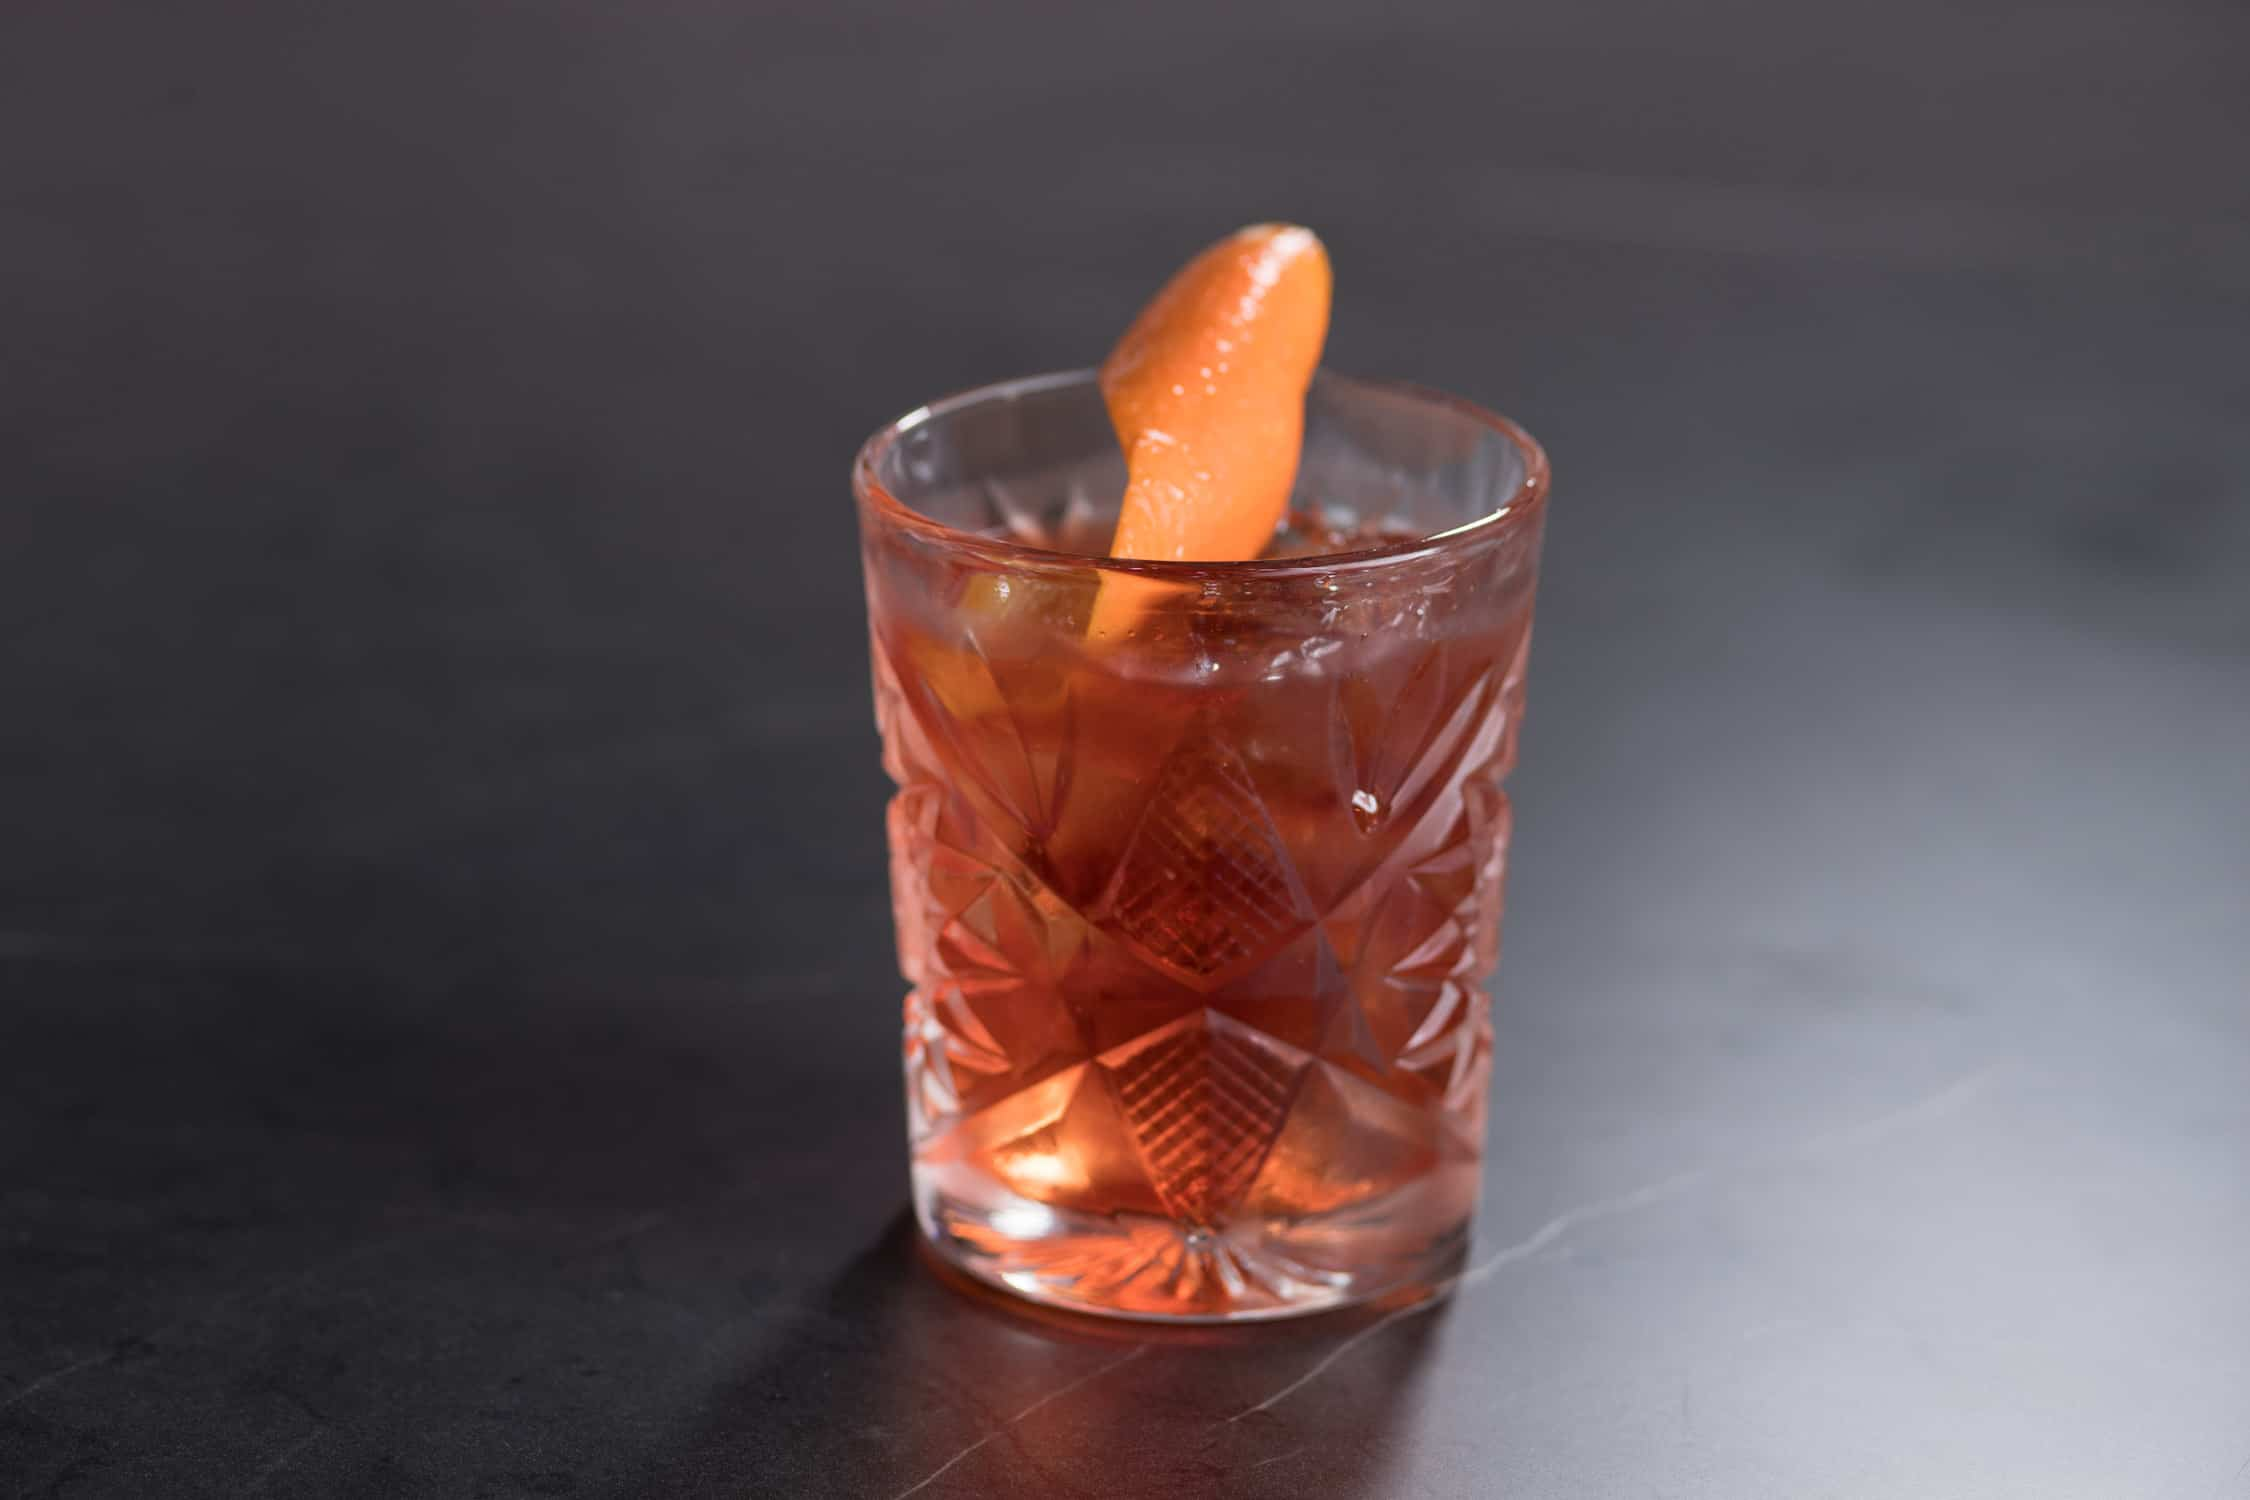 Cocktail with orange swirl served at Saros Bar